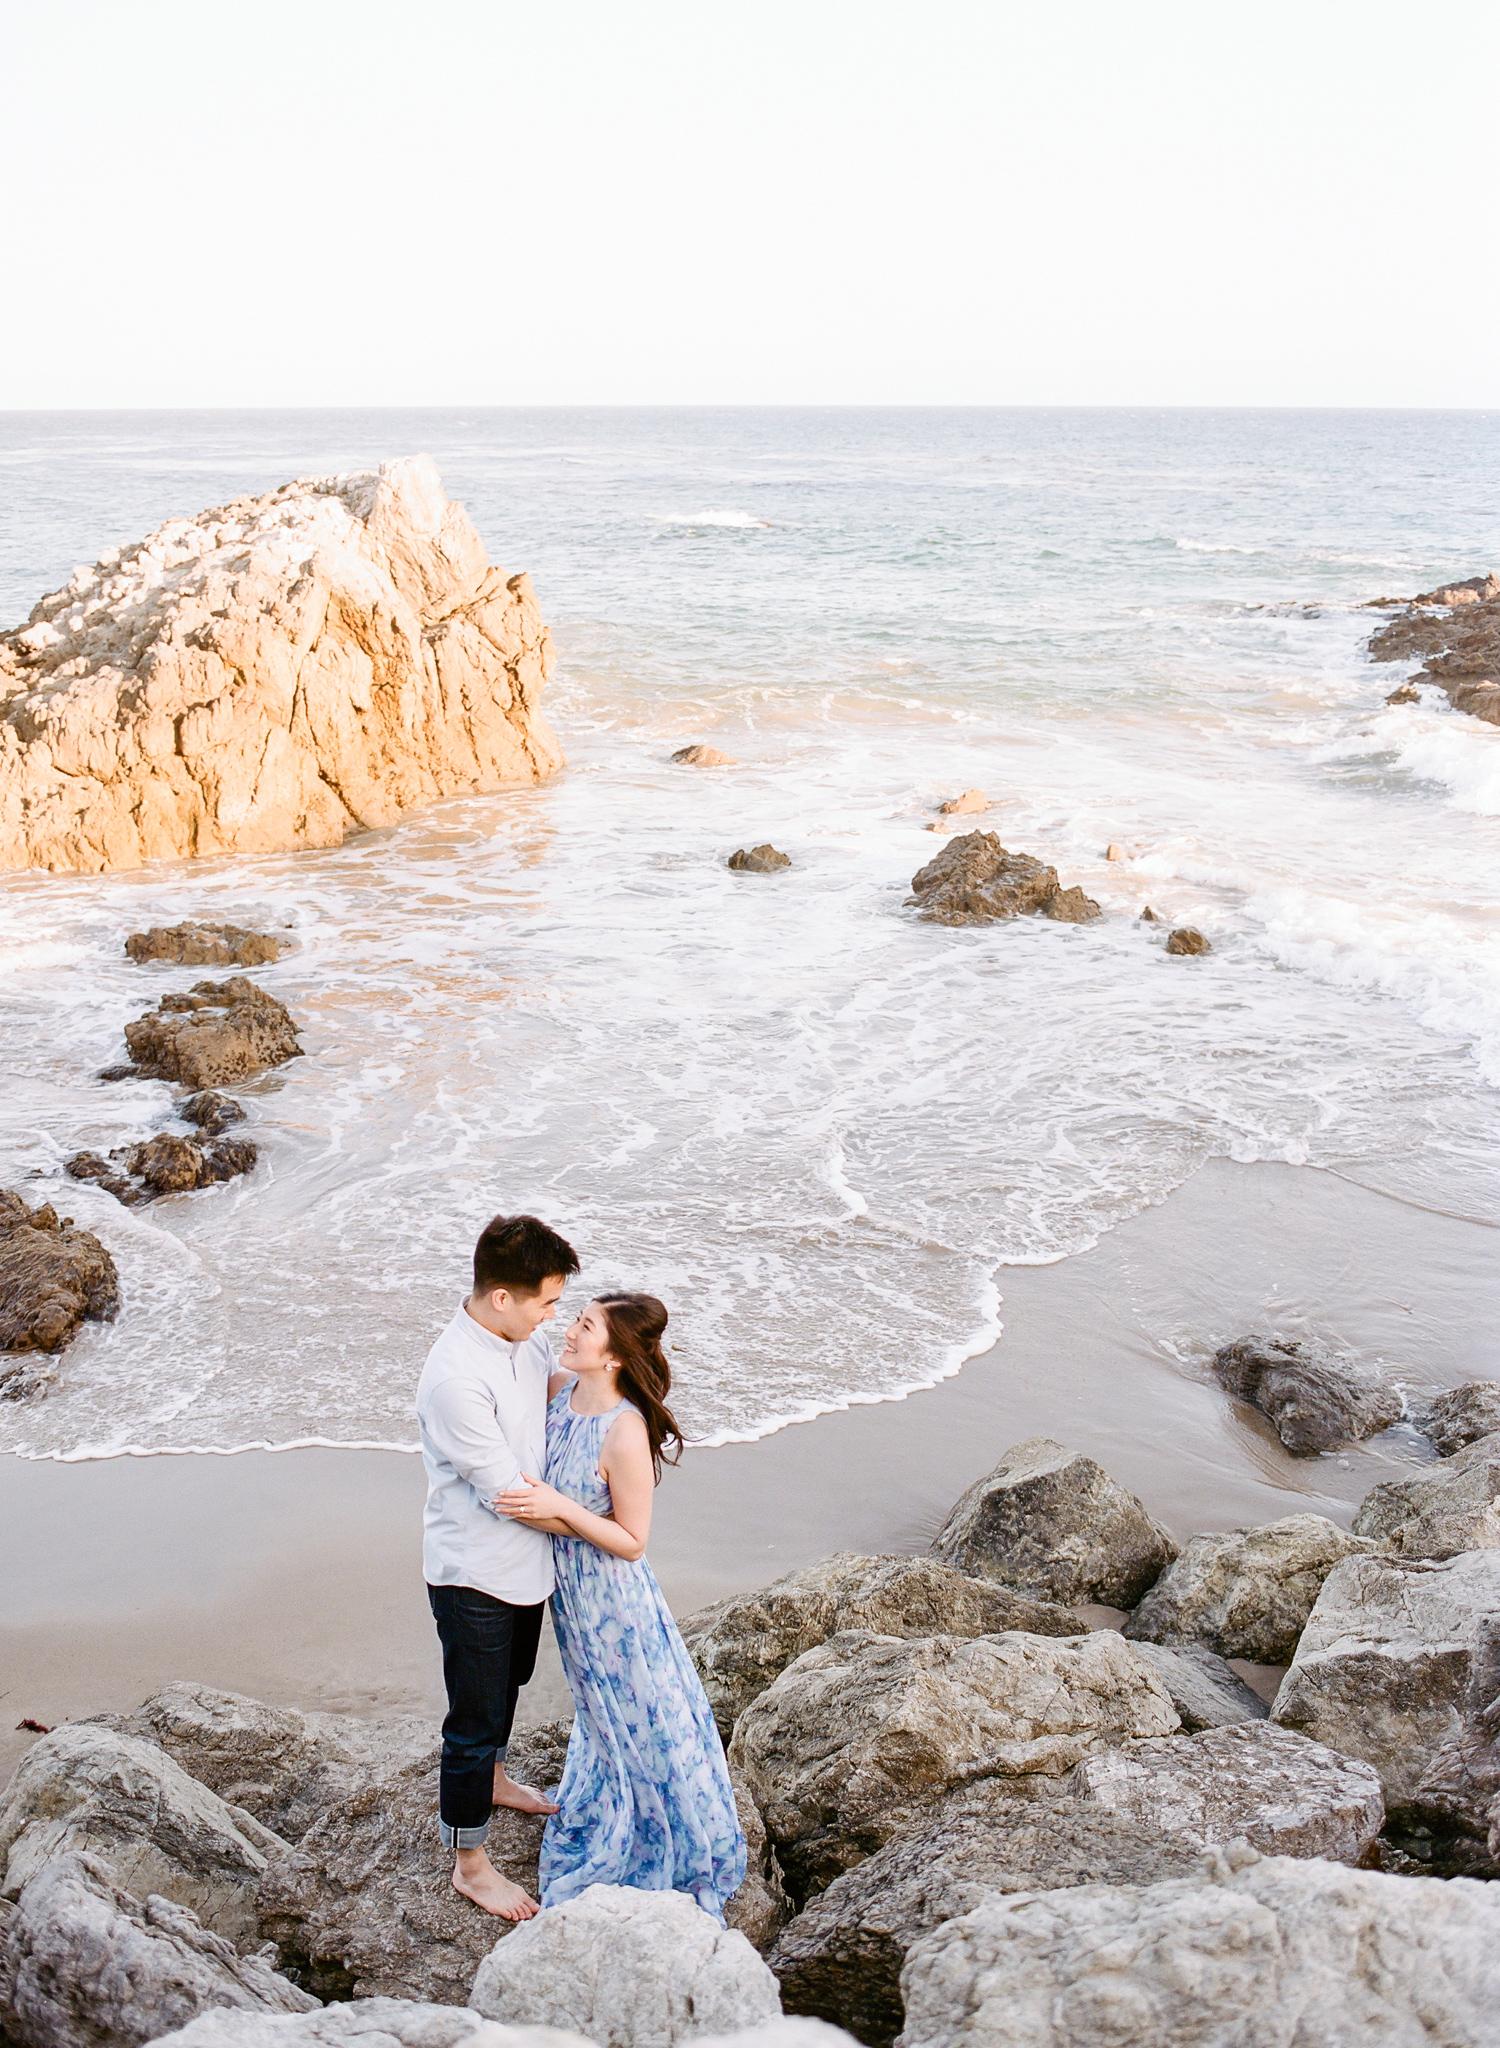 036-Jen-Wojcik-Photography-San-Diego-Wedding-Photographer.jpg